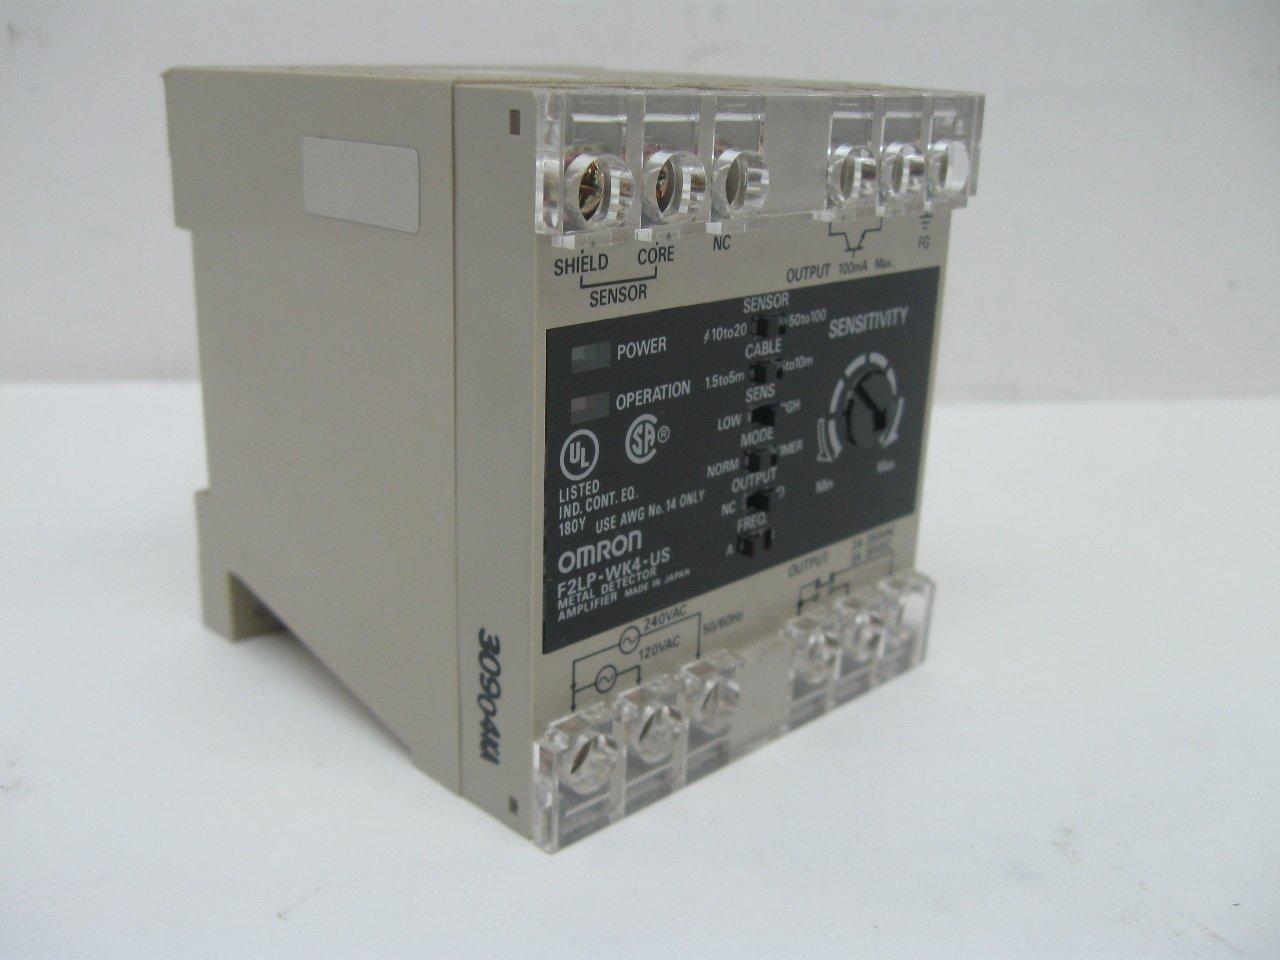 Omron F2LP-WK4-US Amplifier 100/200vac T14879: Mechanical Component Equipment Cases: Amazon.com: Industrial & Scientific